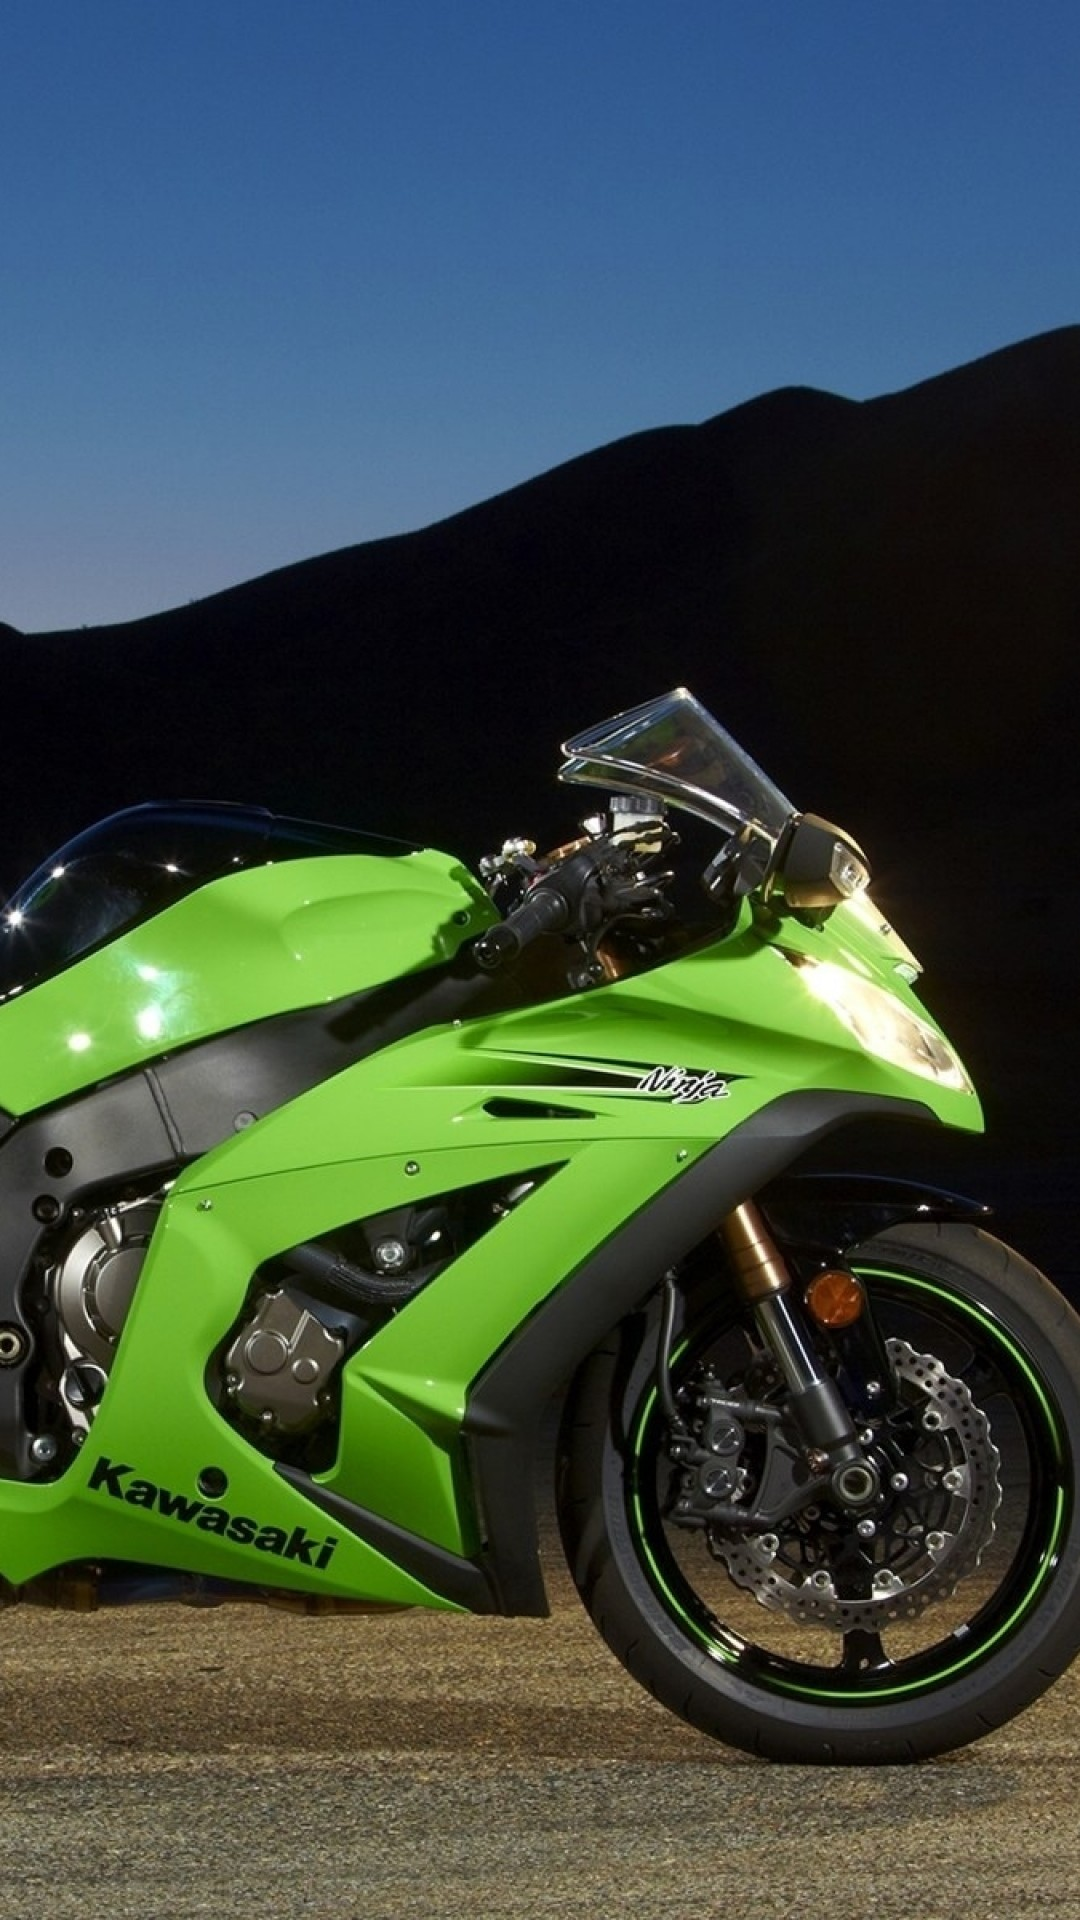 Kawasaki Ninja H2r >> Kawasaki Ninja Wallpaper HD (68+ images)